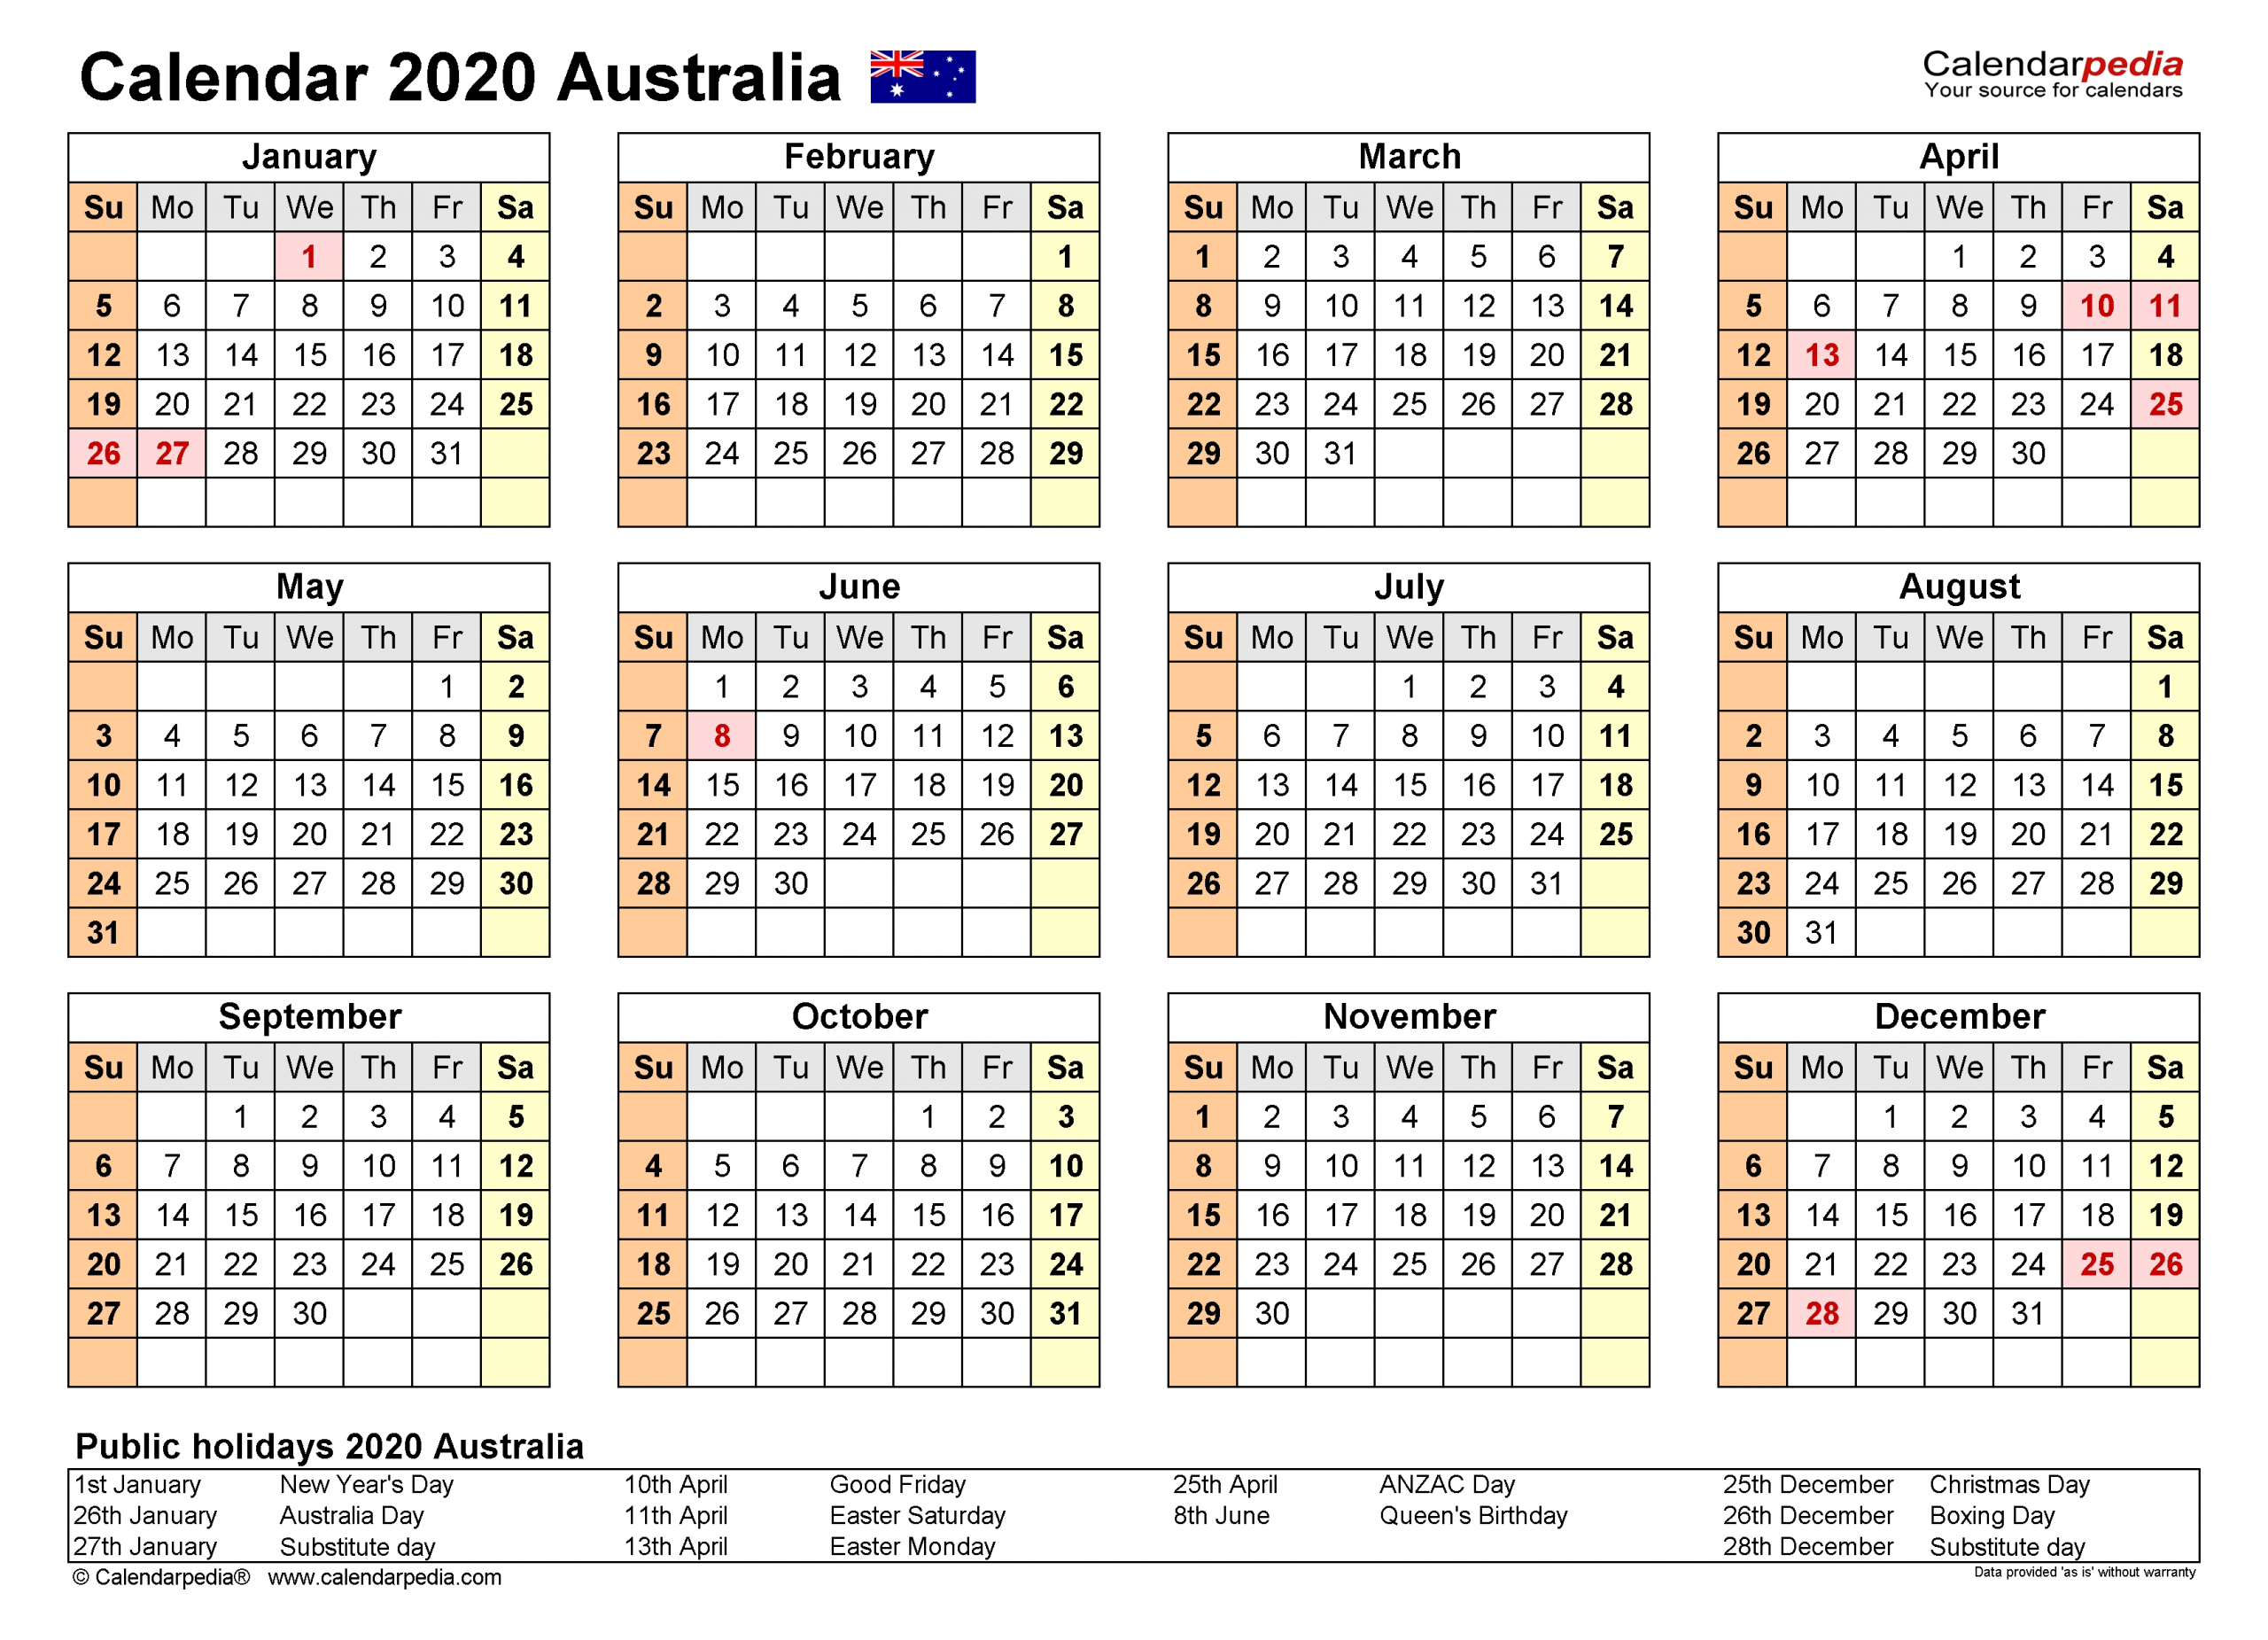 Australia Calendar 2020 - Free Printable Pdf Templates  Yearly Calendars Australia